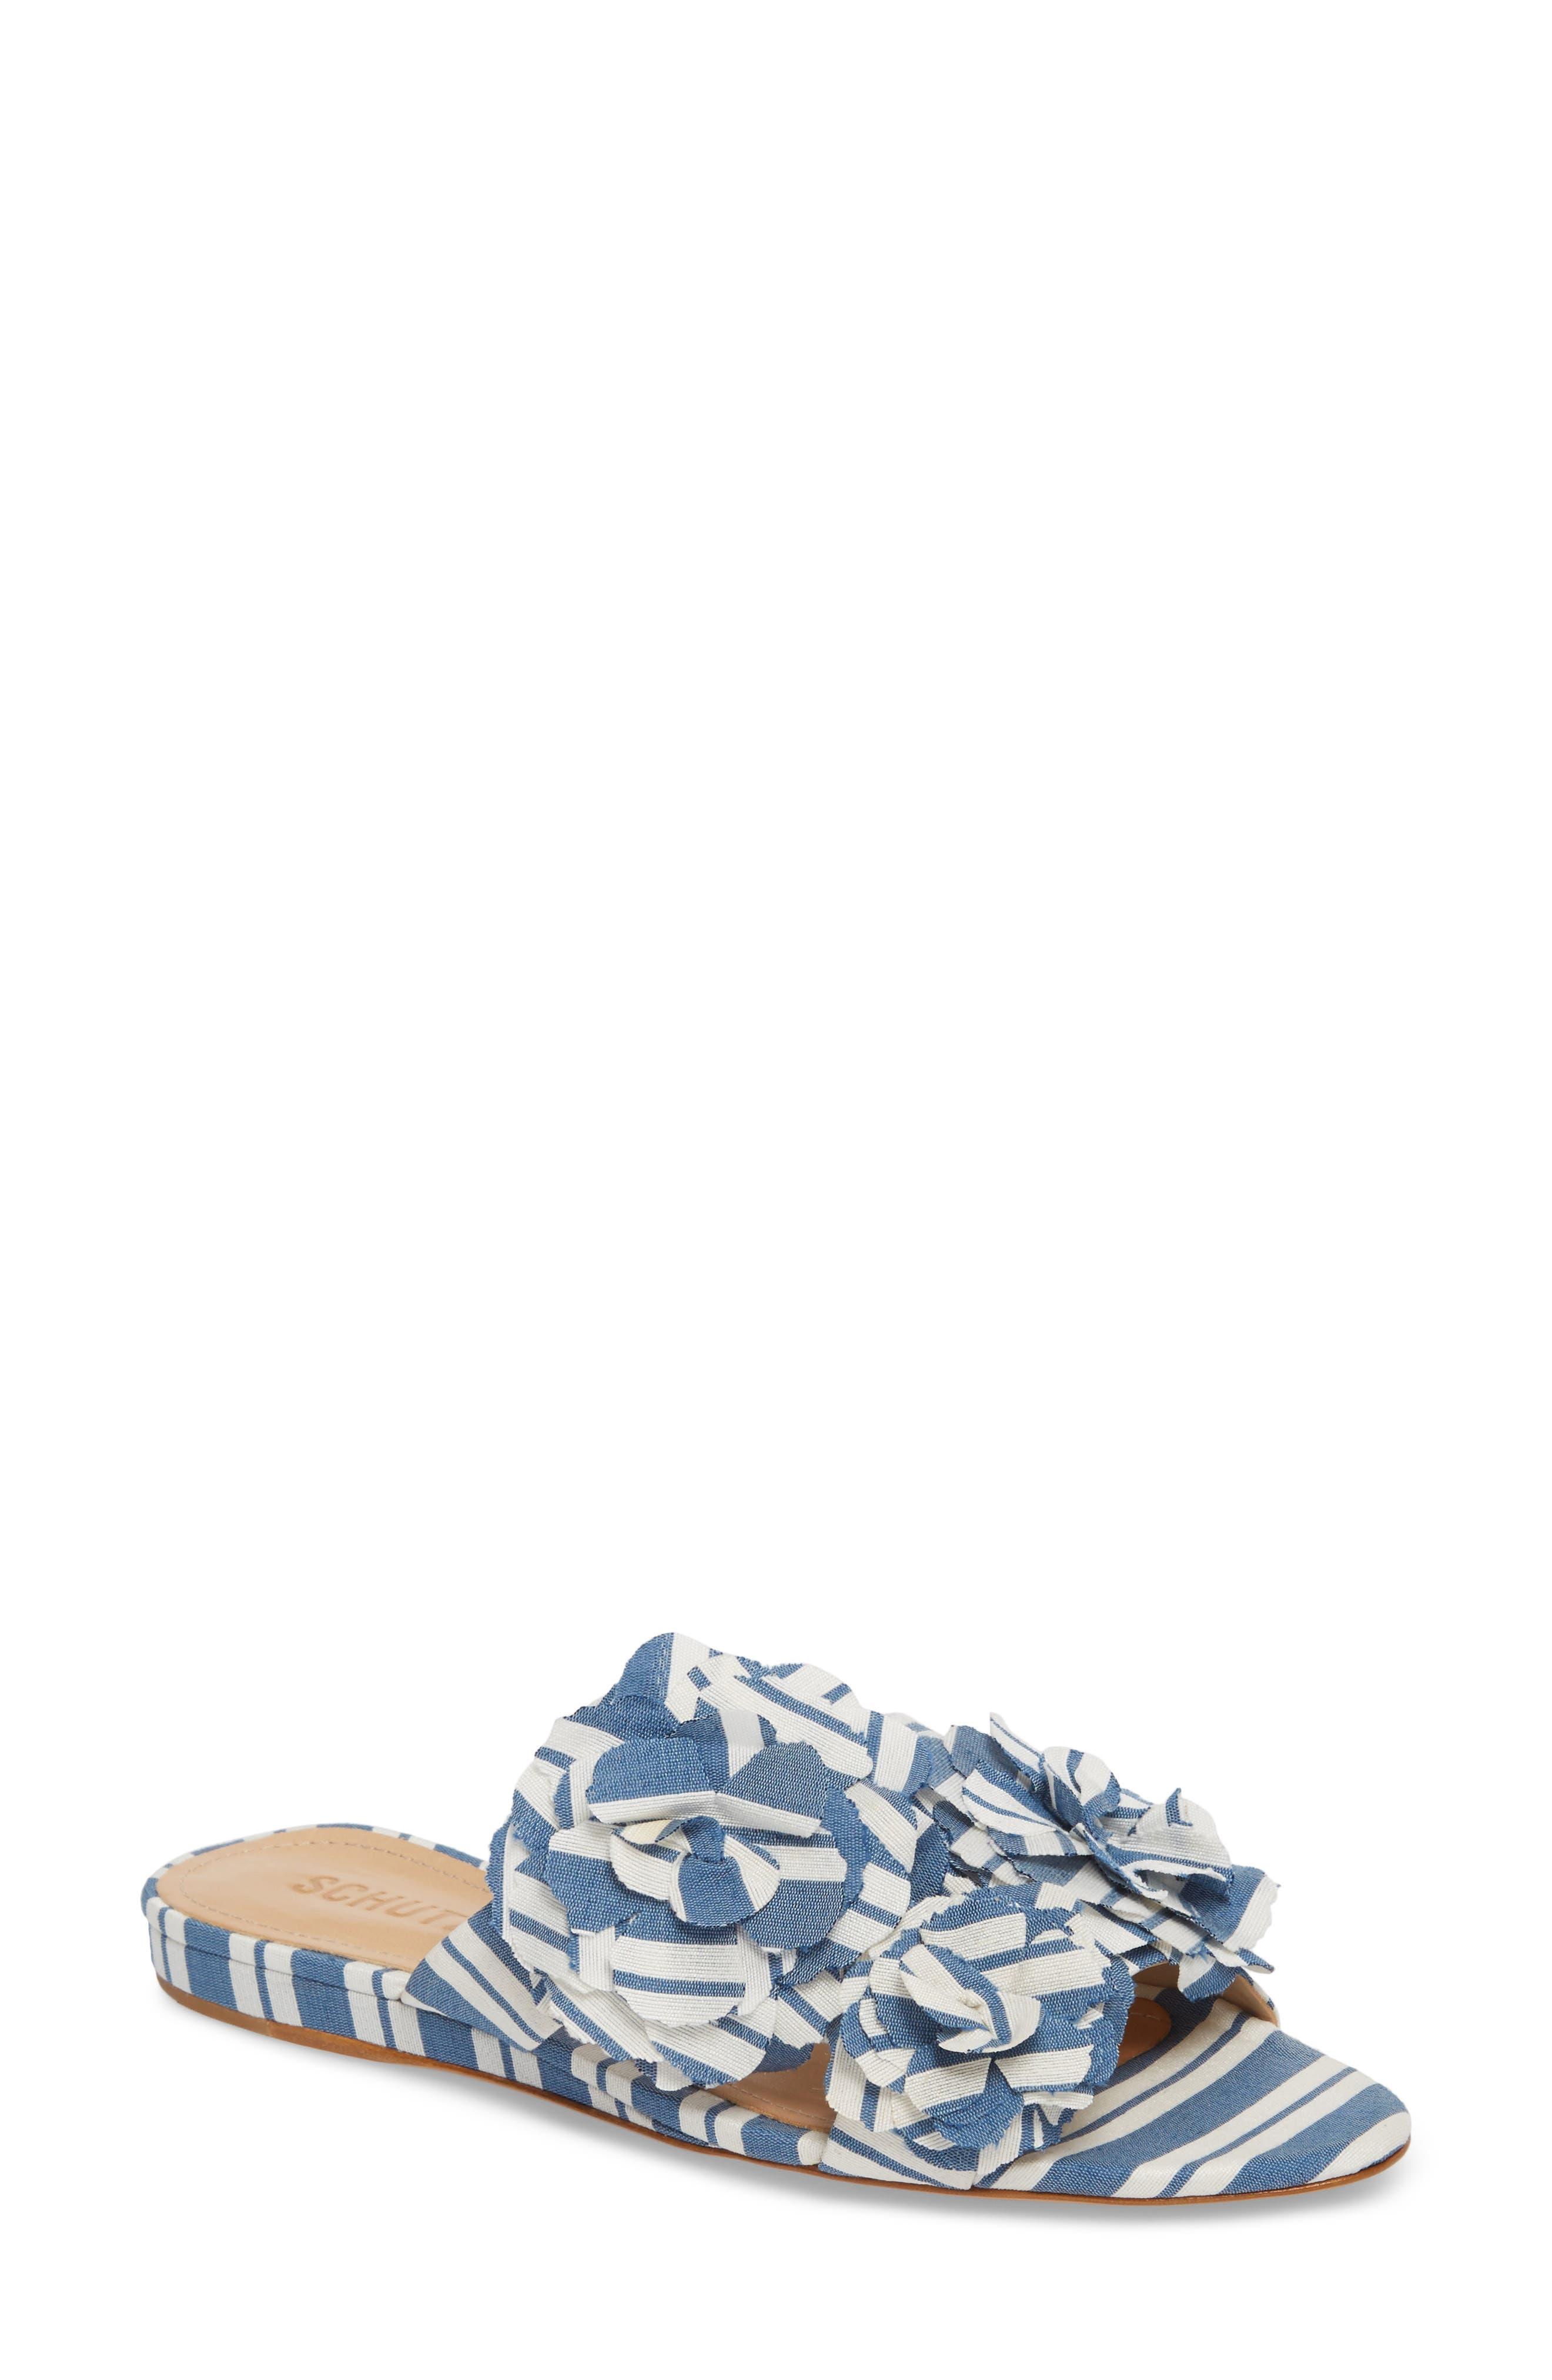 Alternate Image 1 Selected - Schutz Ilaria Flower Sandal (Women)